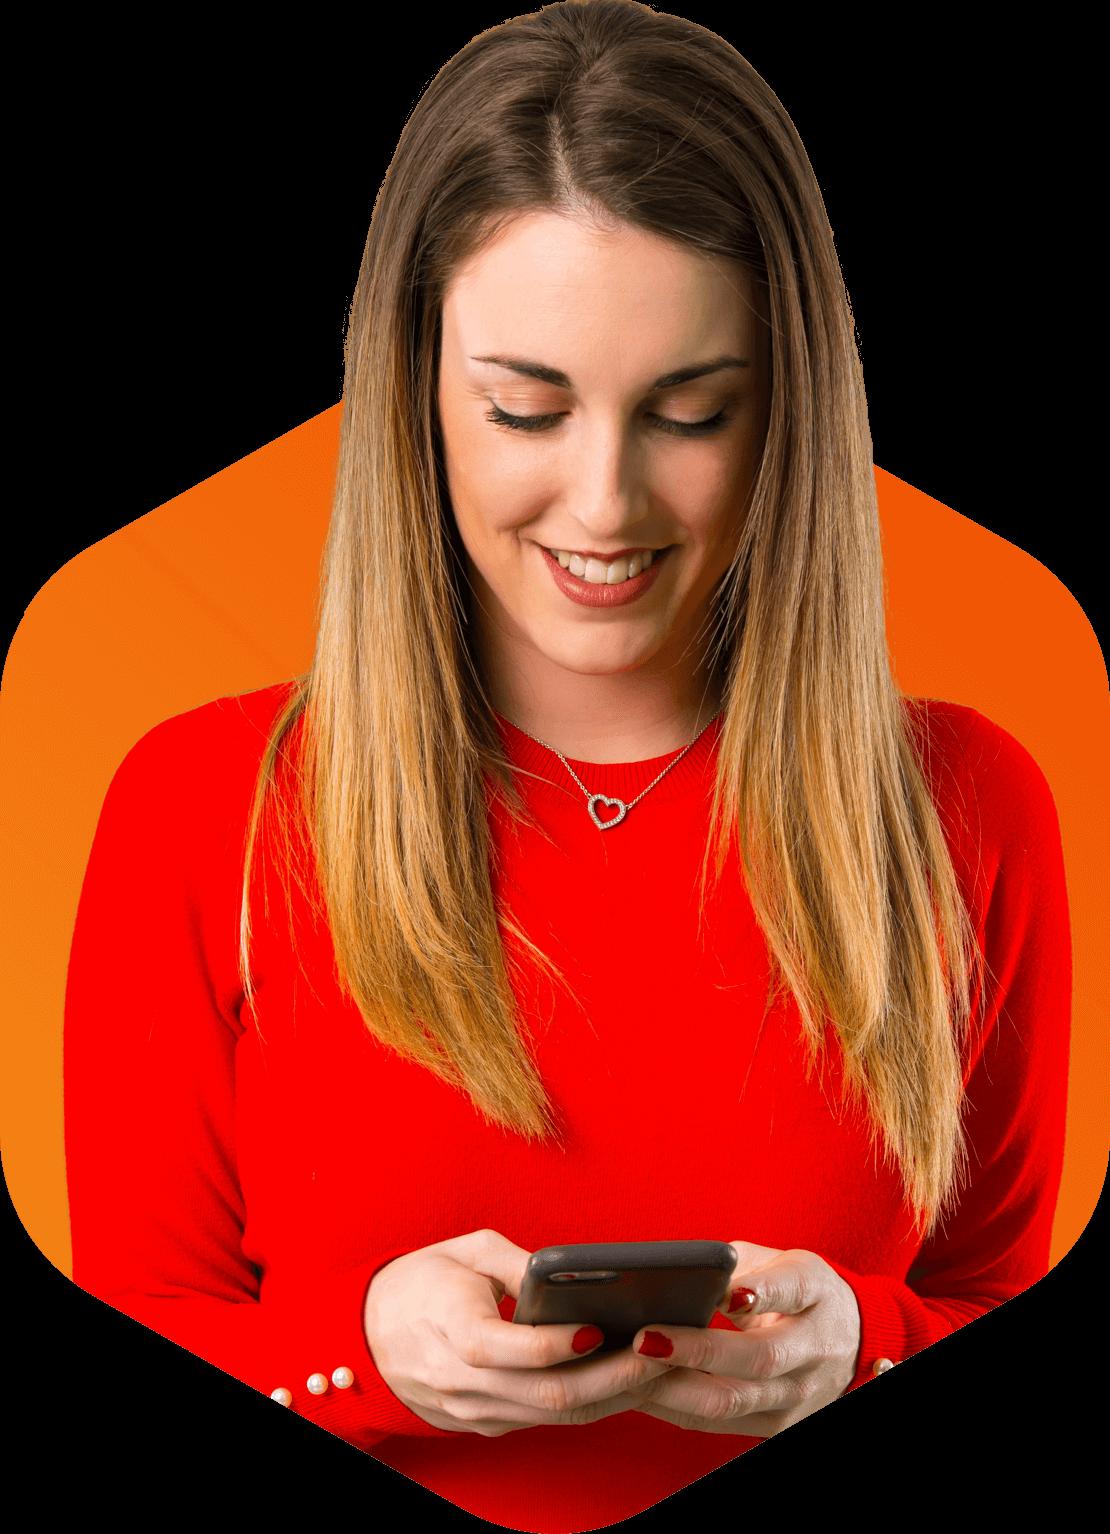 Mulher usando o smartphone